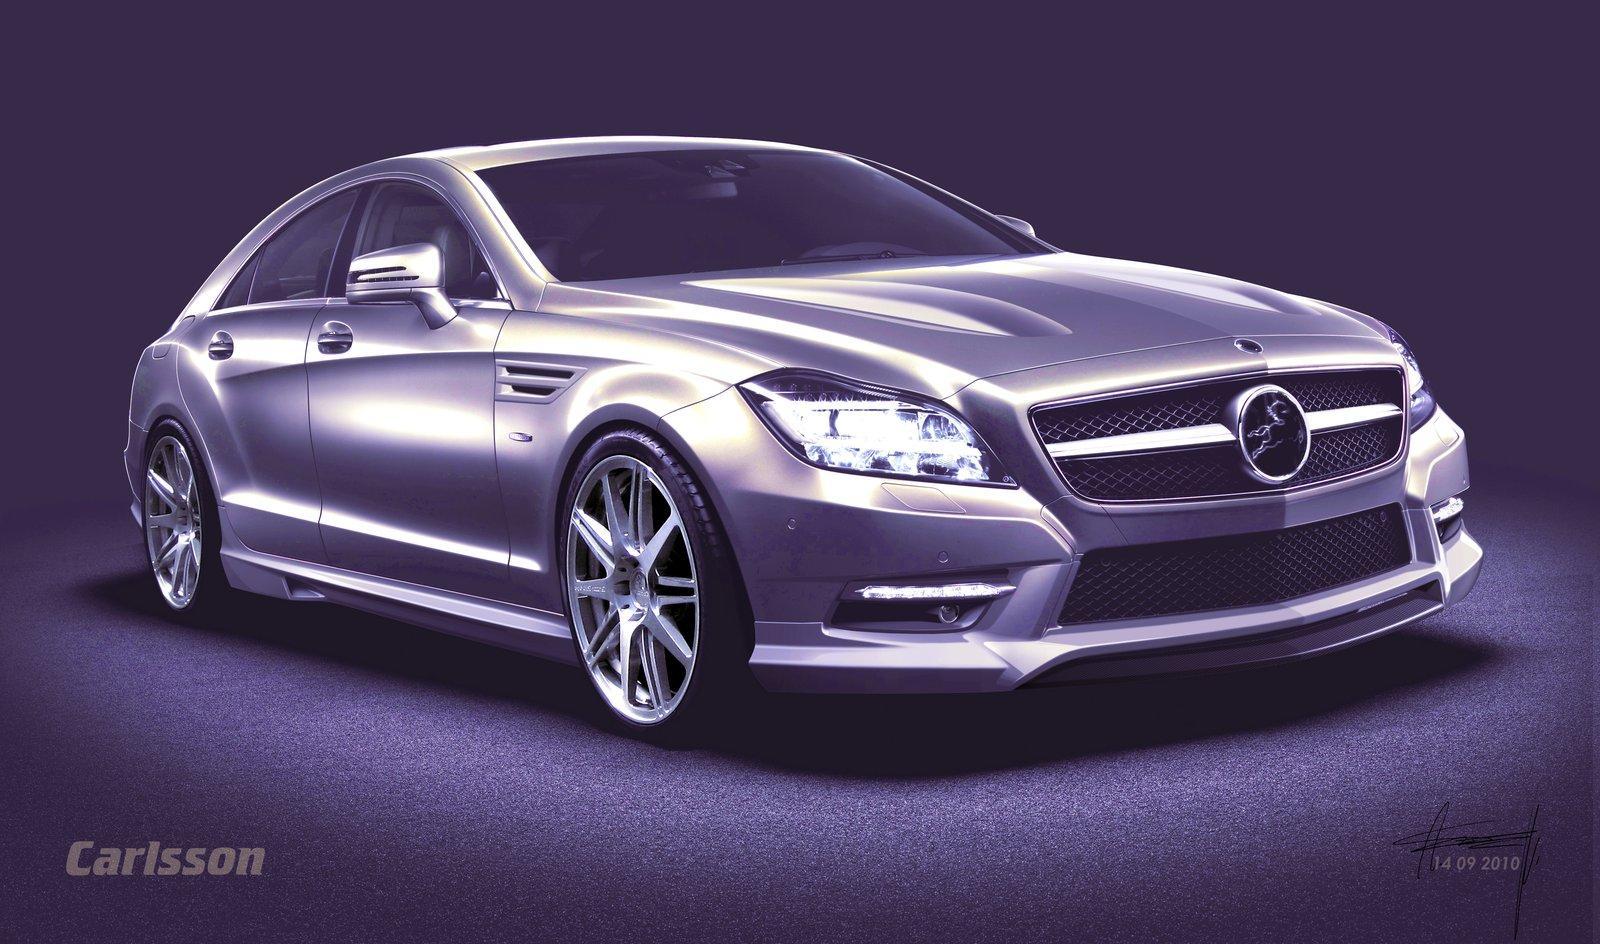 2012 Carlsson Mercedes-Benz CLS - фотография №1